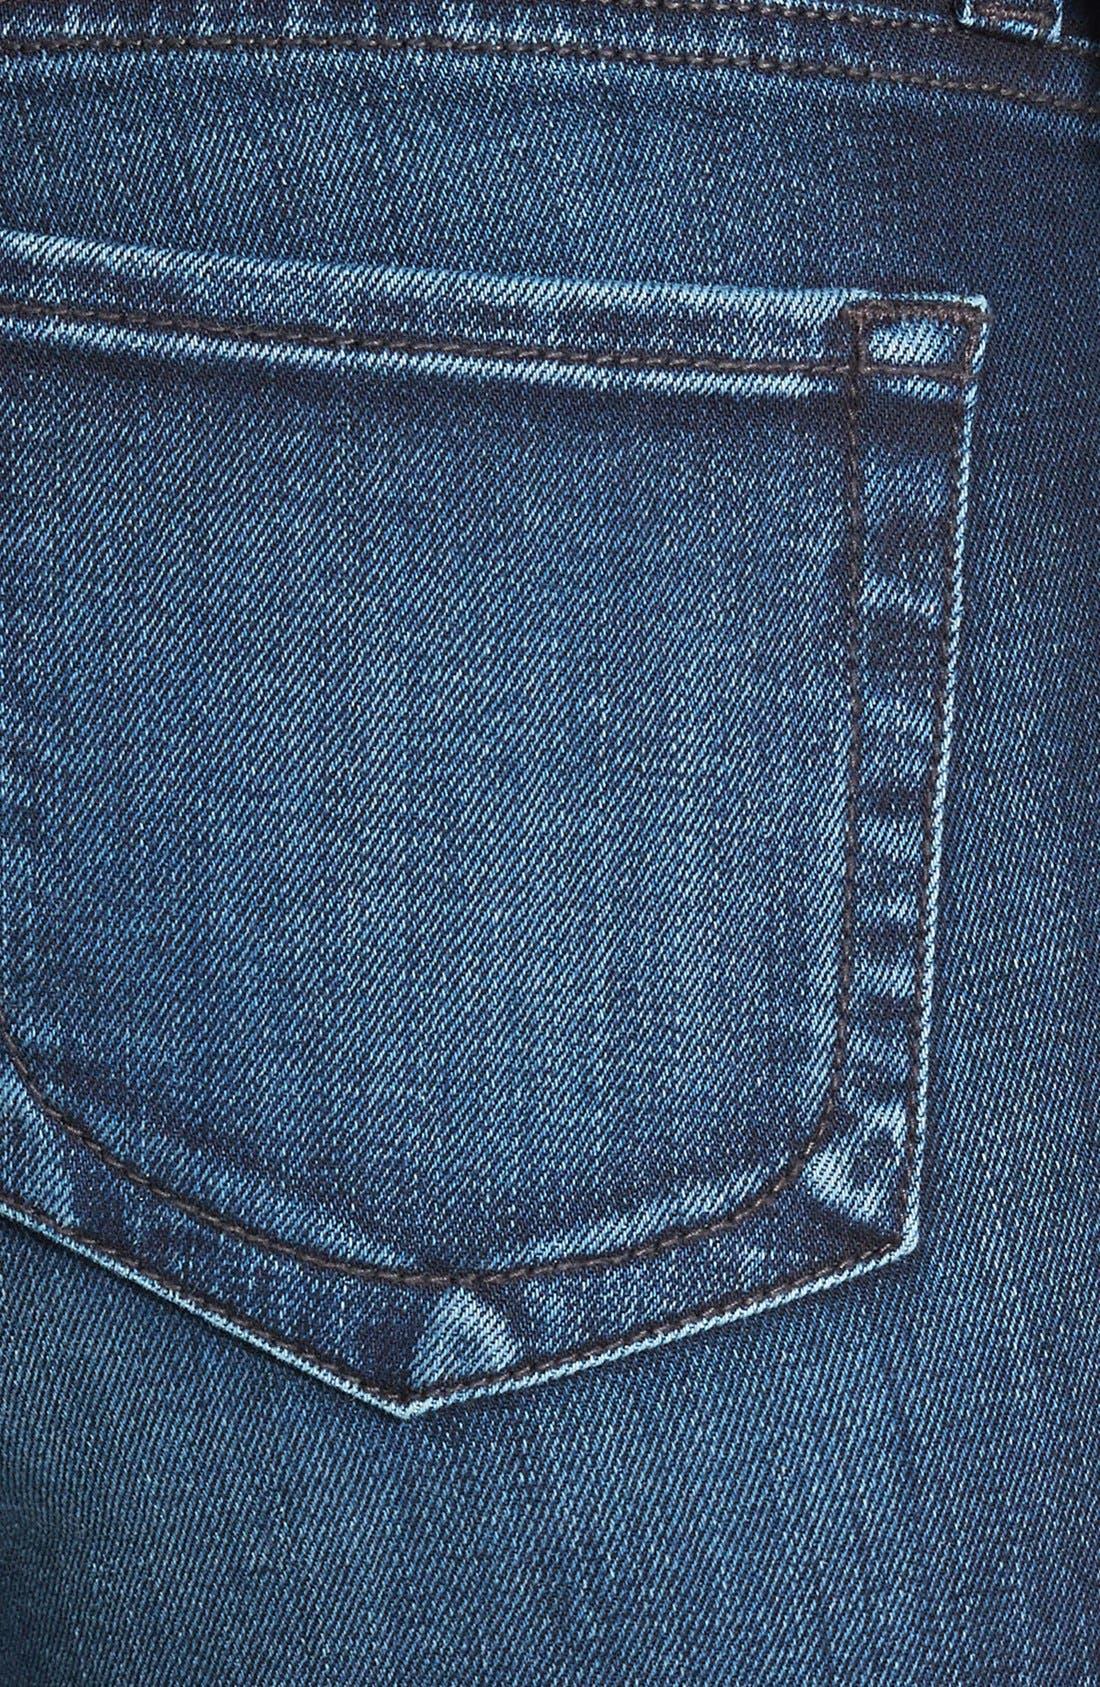 Alternate Image 3  - KUT from the Kloth 'Diana' Skinny Jeans (Breezy)